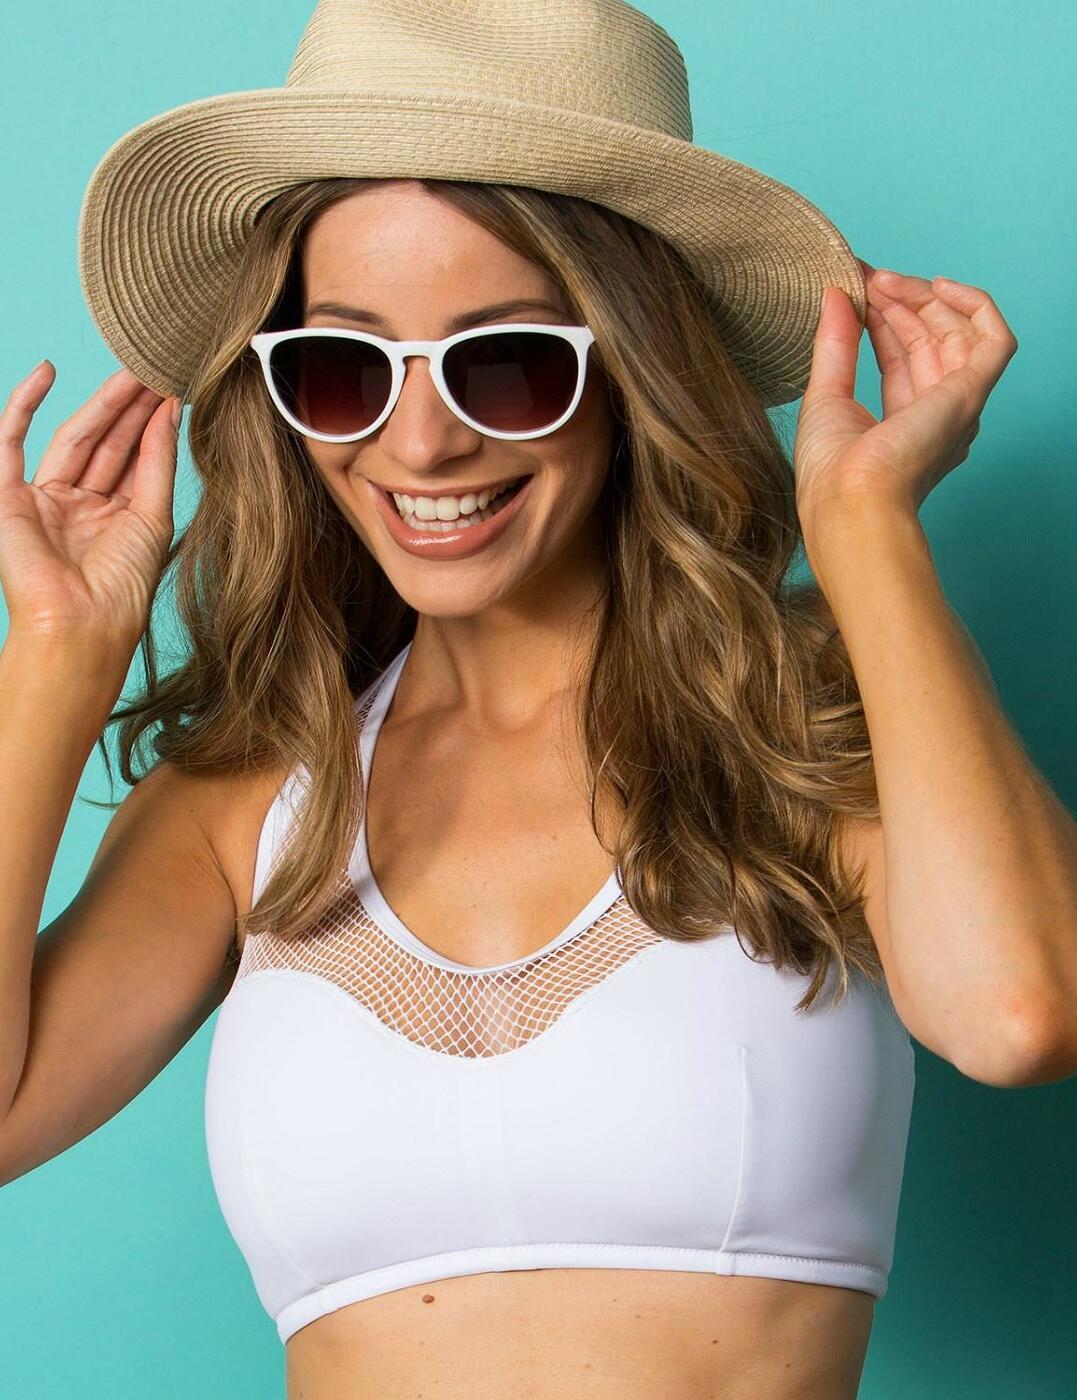 30007 Pour Moi? Glamazon Underwired Half Padded Halterneck Mesh Bikini Top - 30007 White